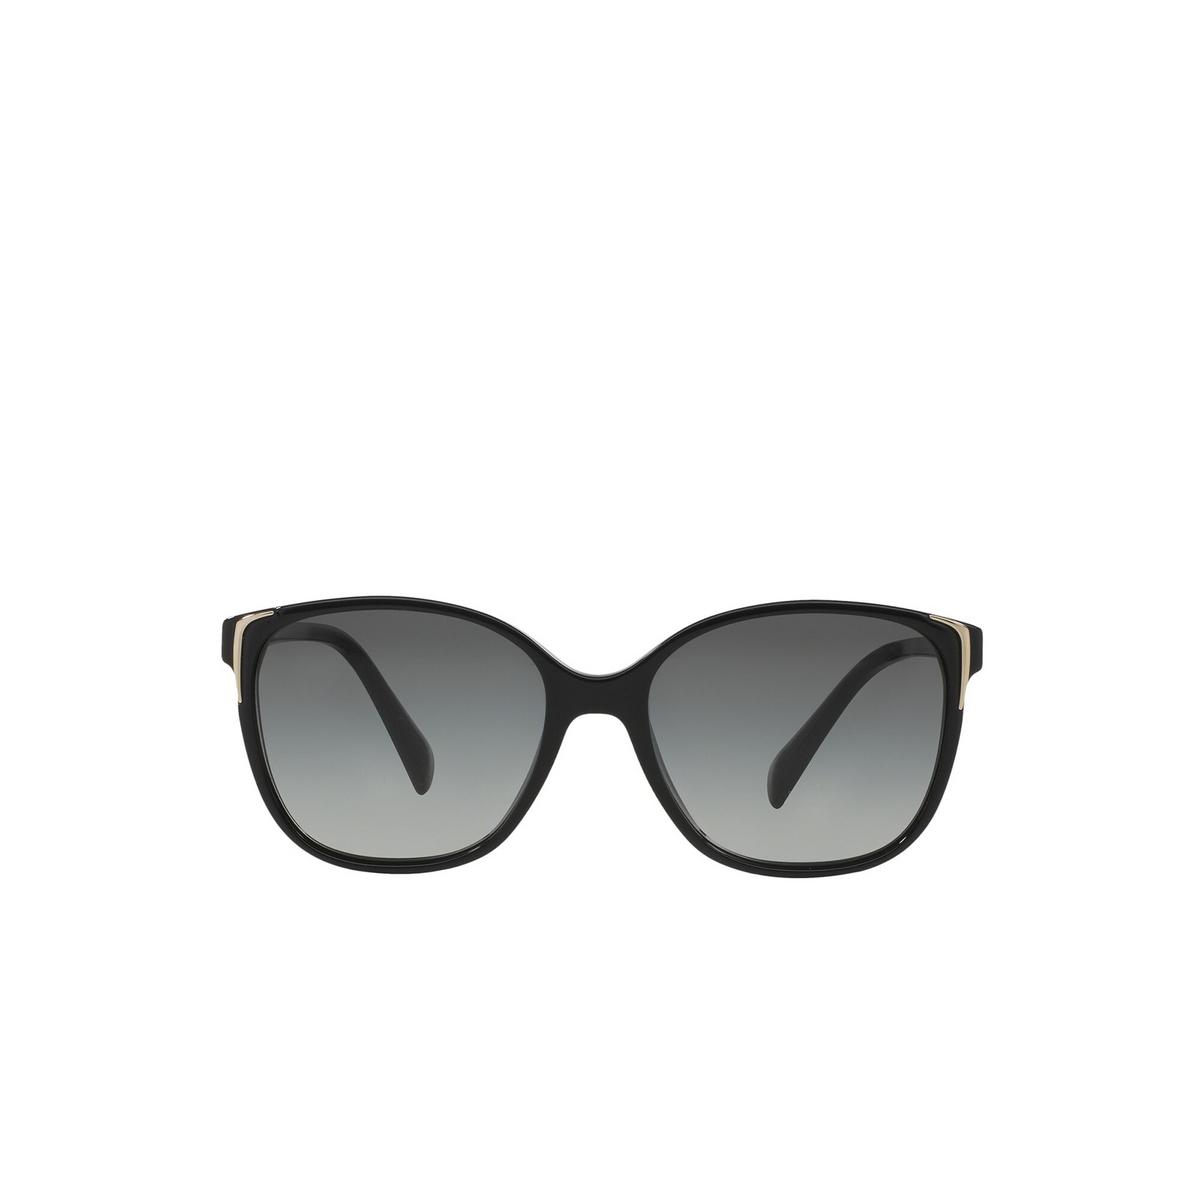 Prada® Cat-eye Sunglasses: PR 01OS color Black 1AB3M1 - front view.